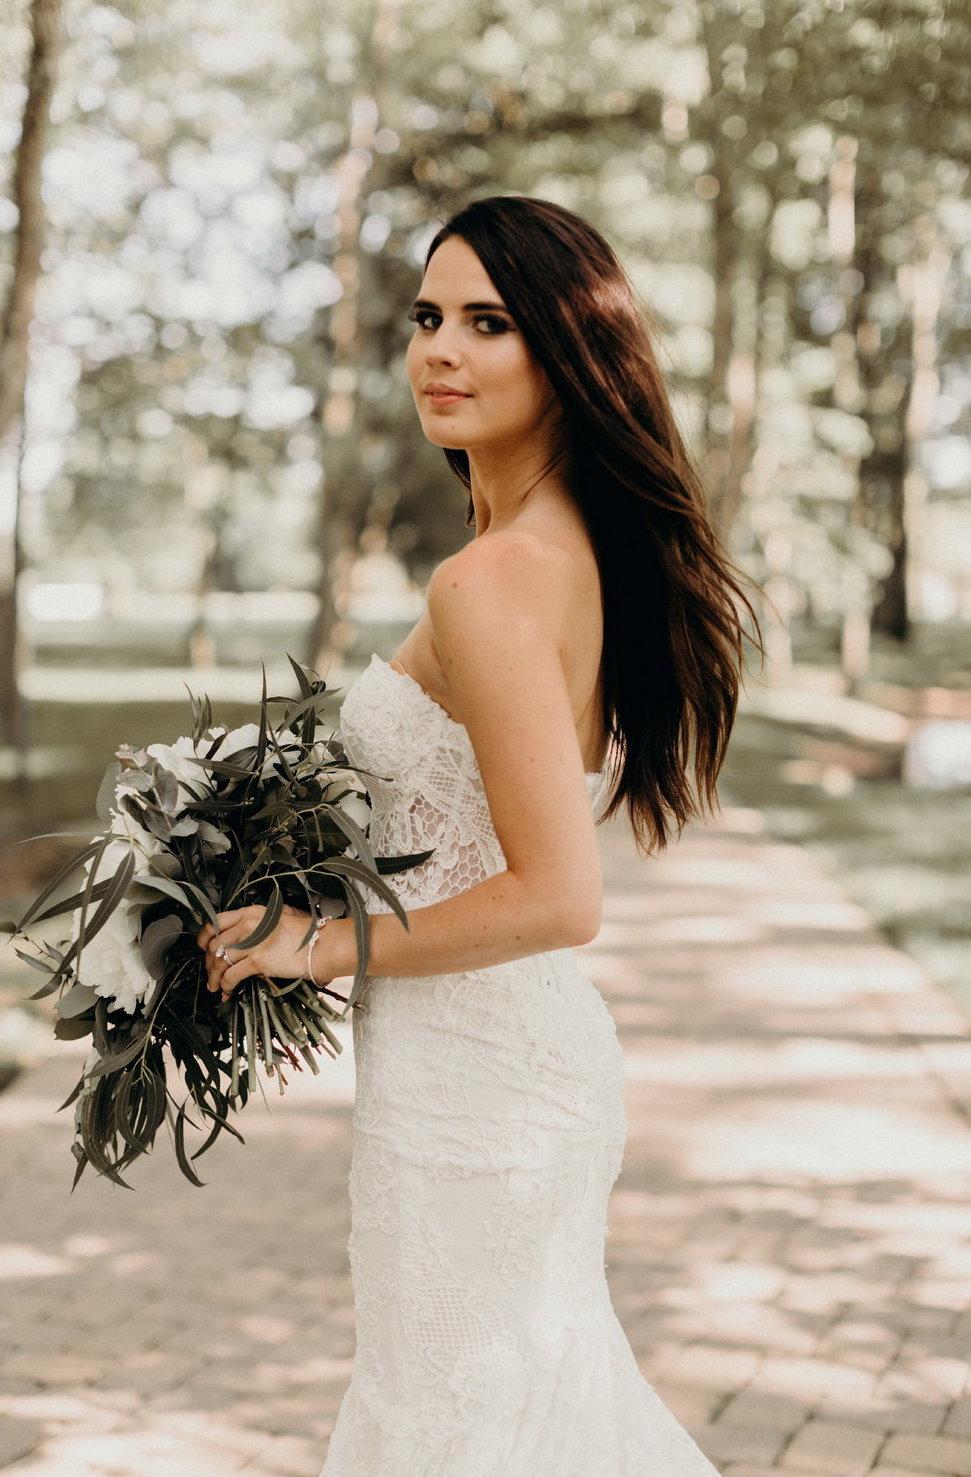 nashville-wedding-dress-boutique.jpg